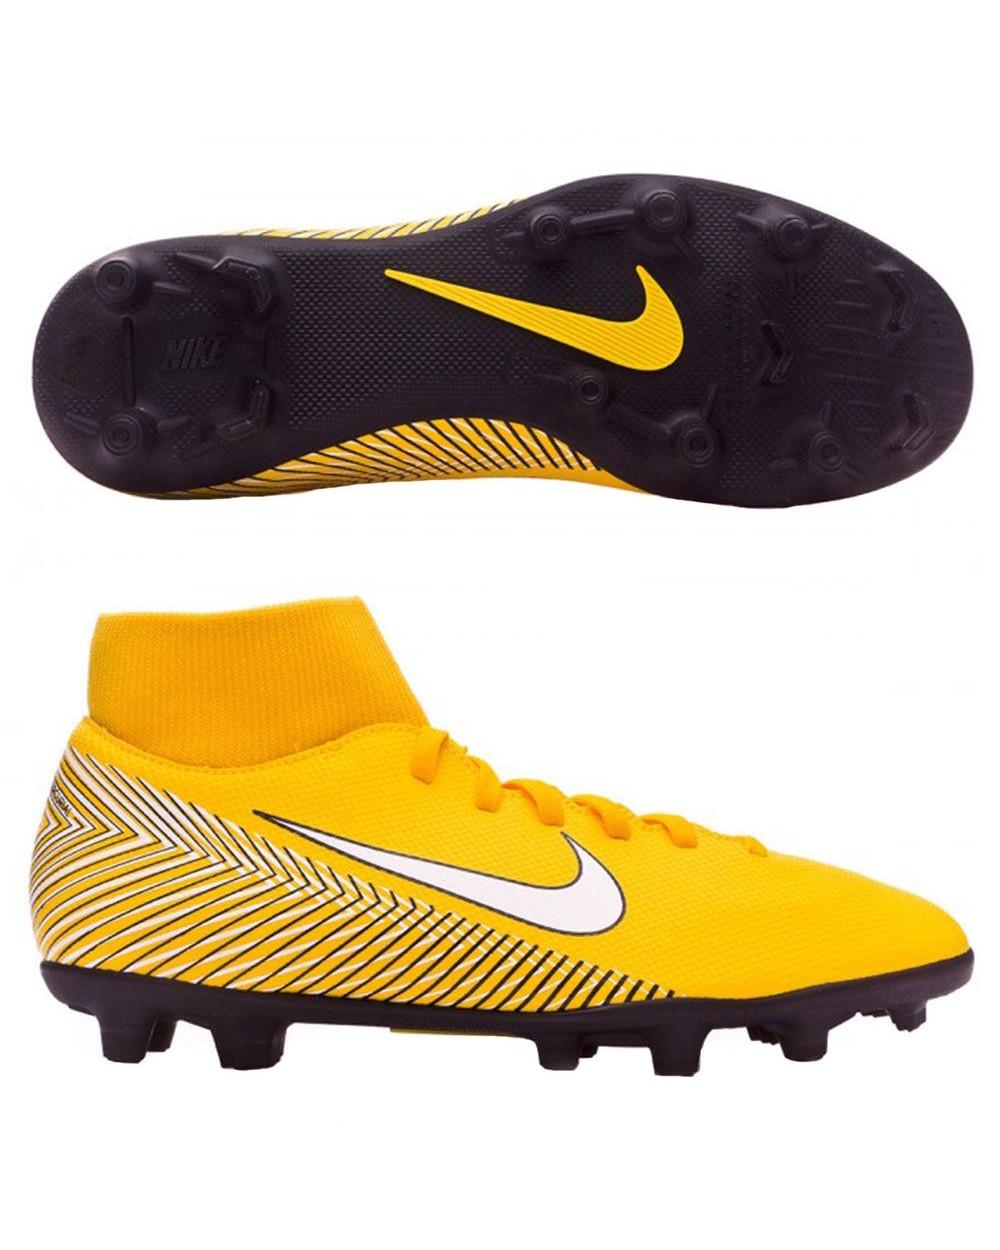 Nike Scarpe Calcio Mercurial Neymar Superfly 6 Club MG arancione con calzino  4 4 di 9 ... f33cf22d86a